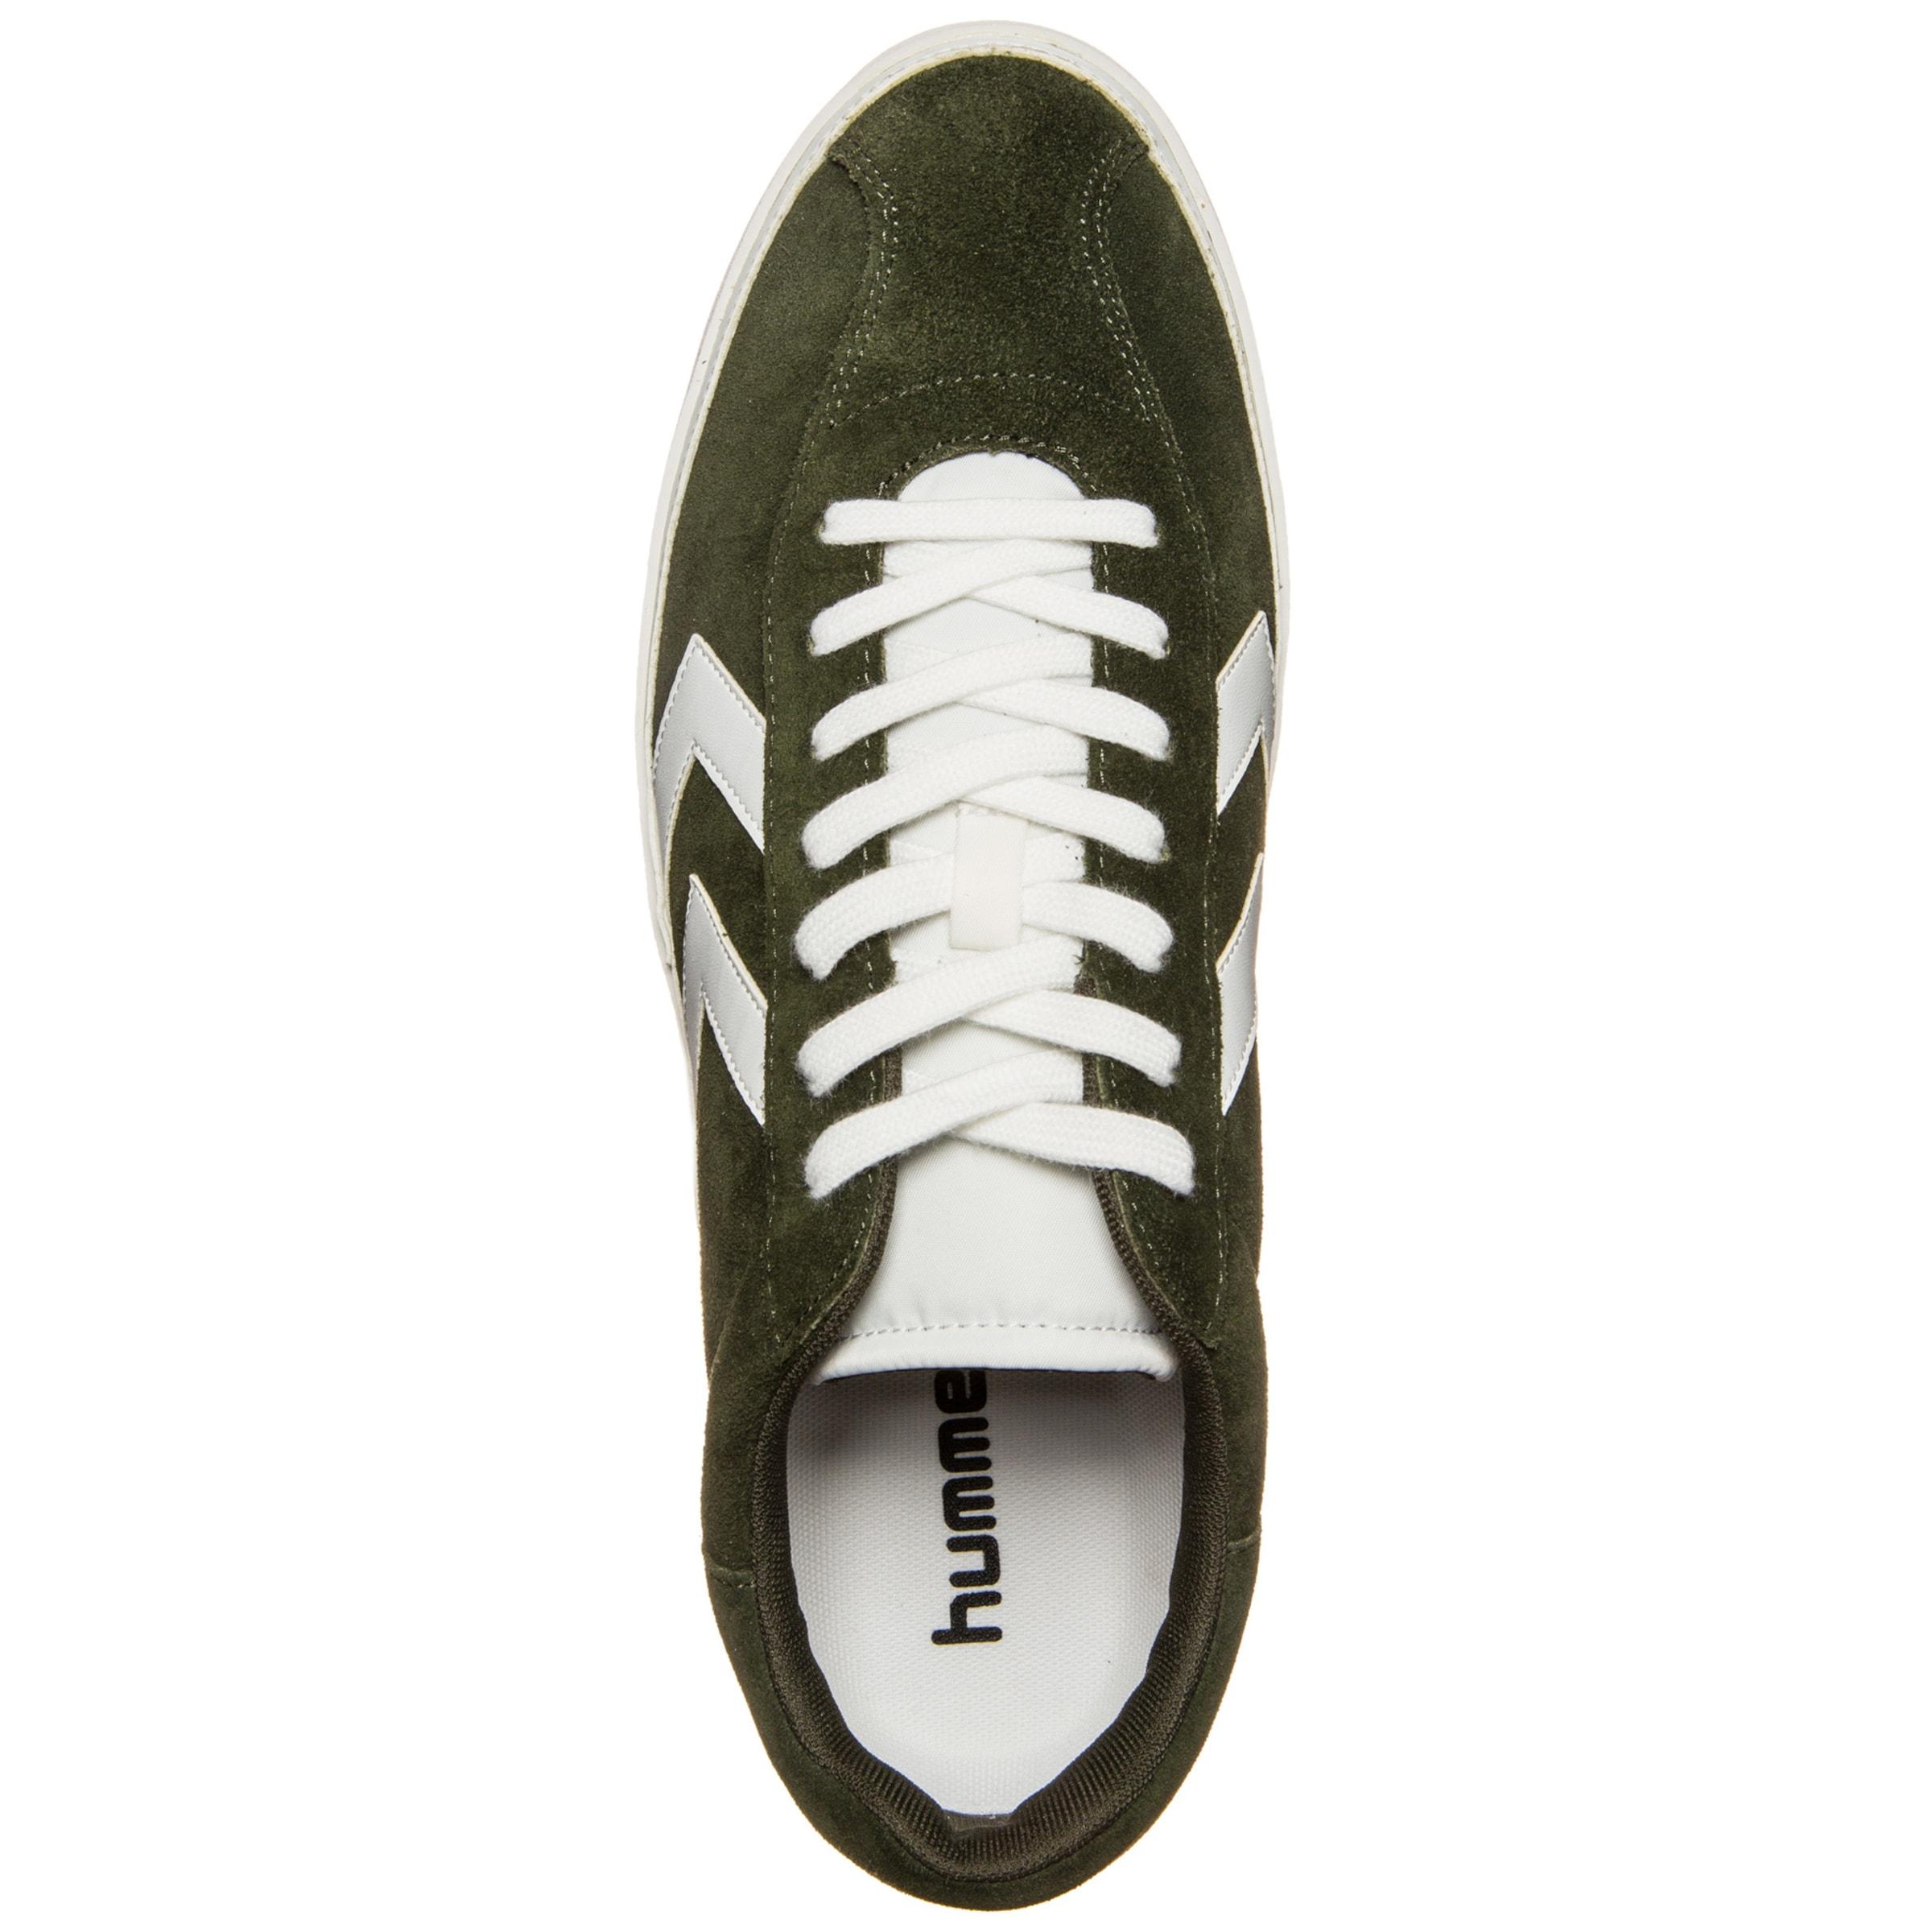 Hummel Sneaker In Oliv Suede' 'diamant wkn0OP